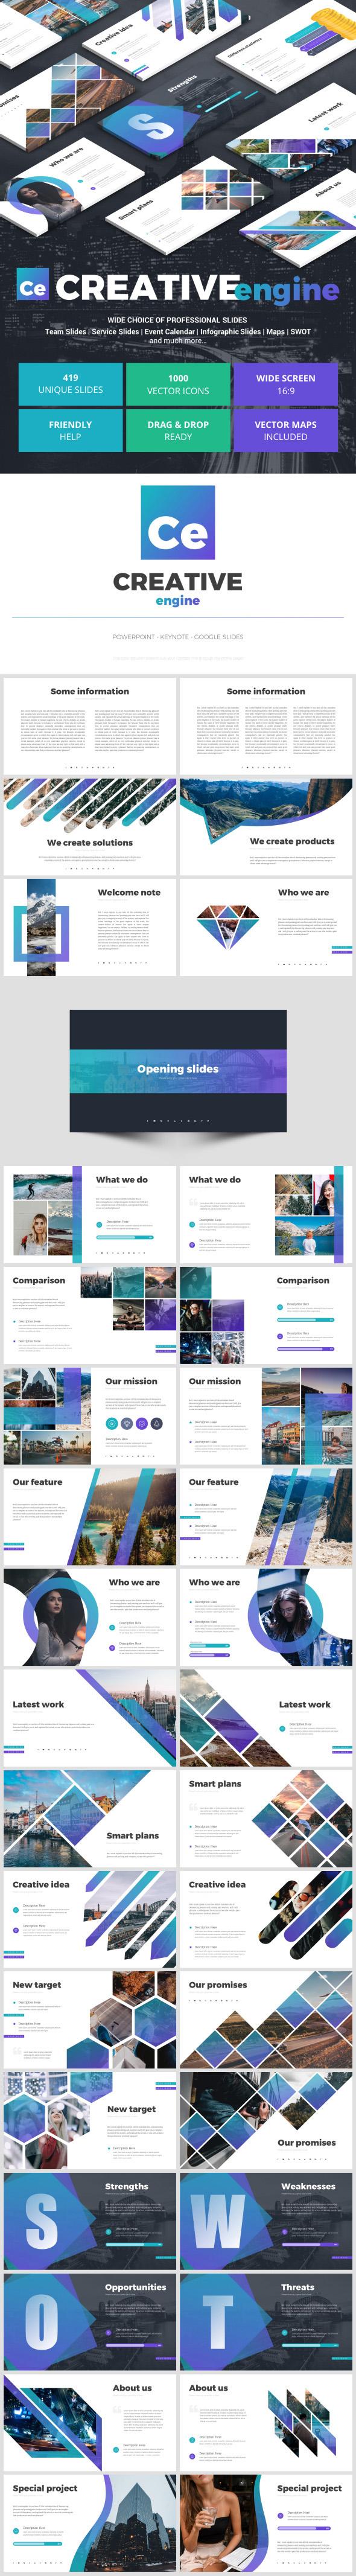 Creative Engine - Google Slides Presentation Templates